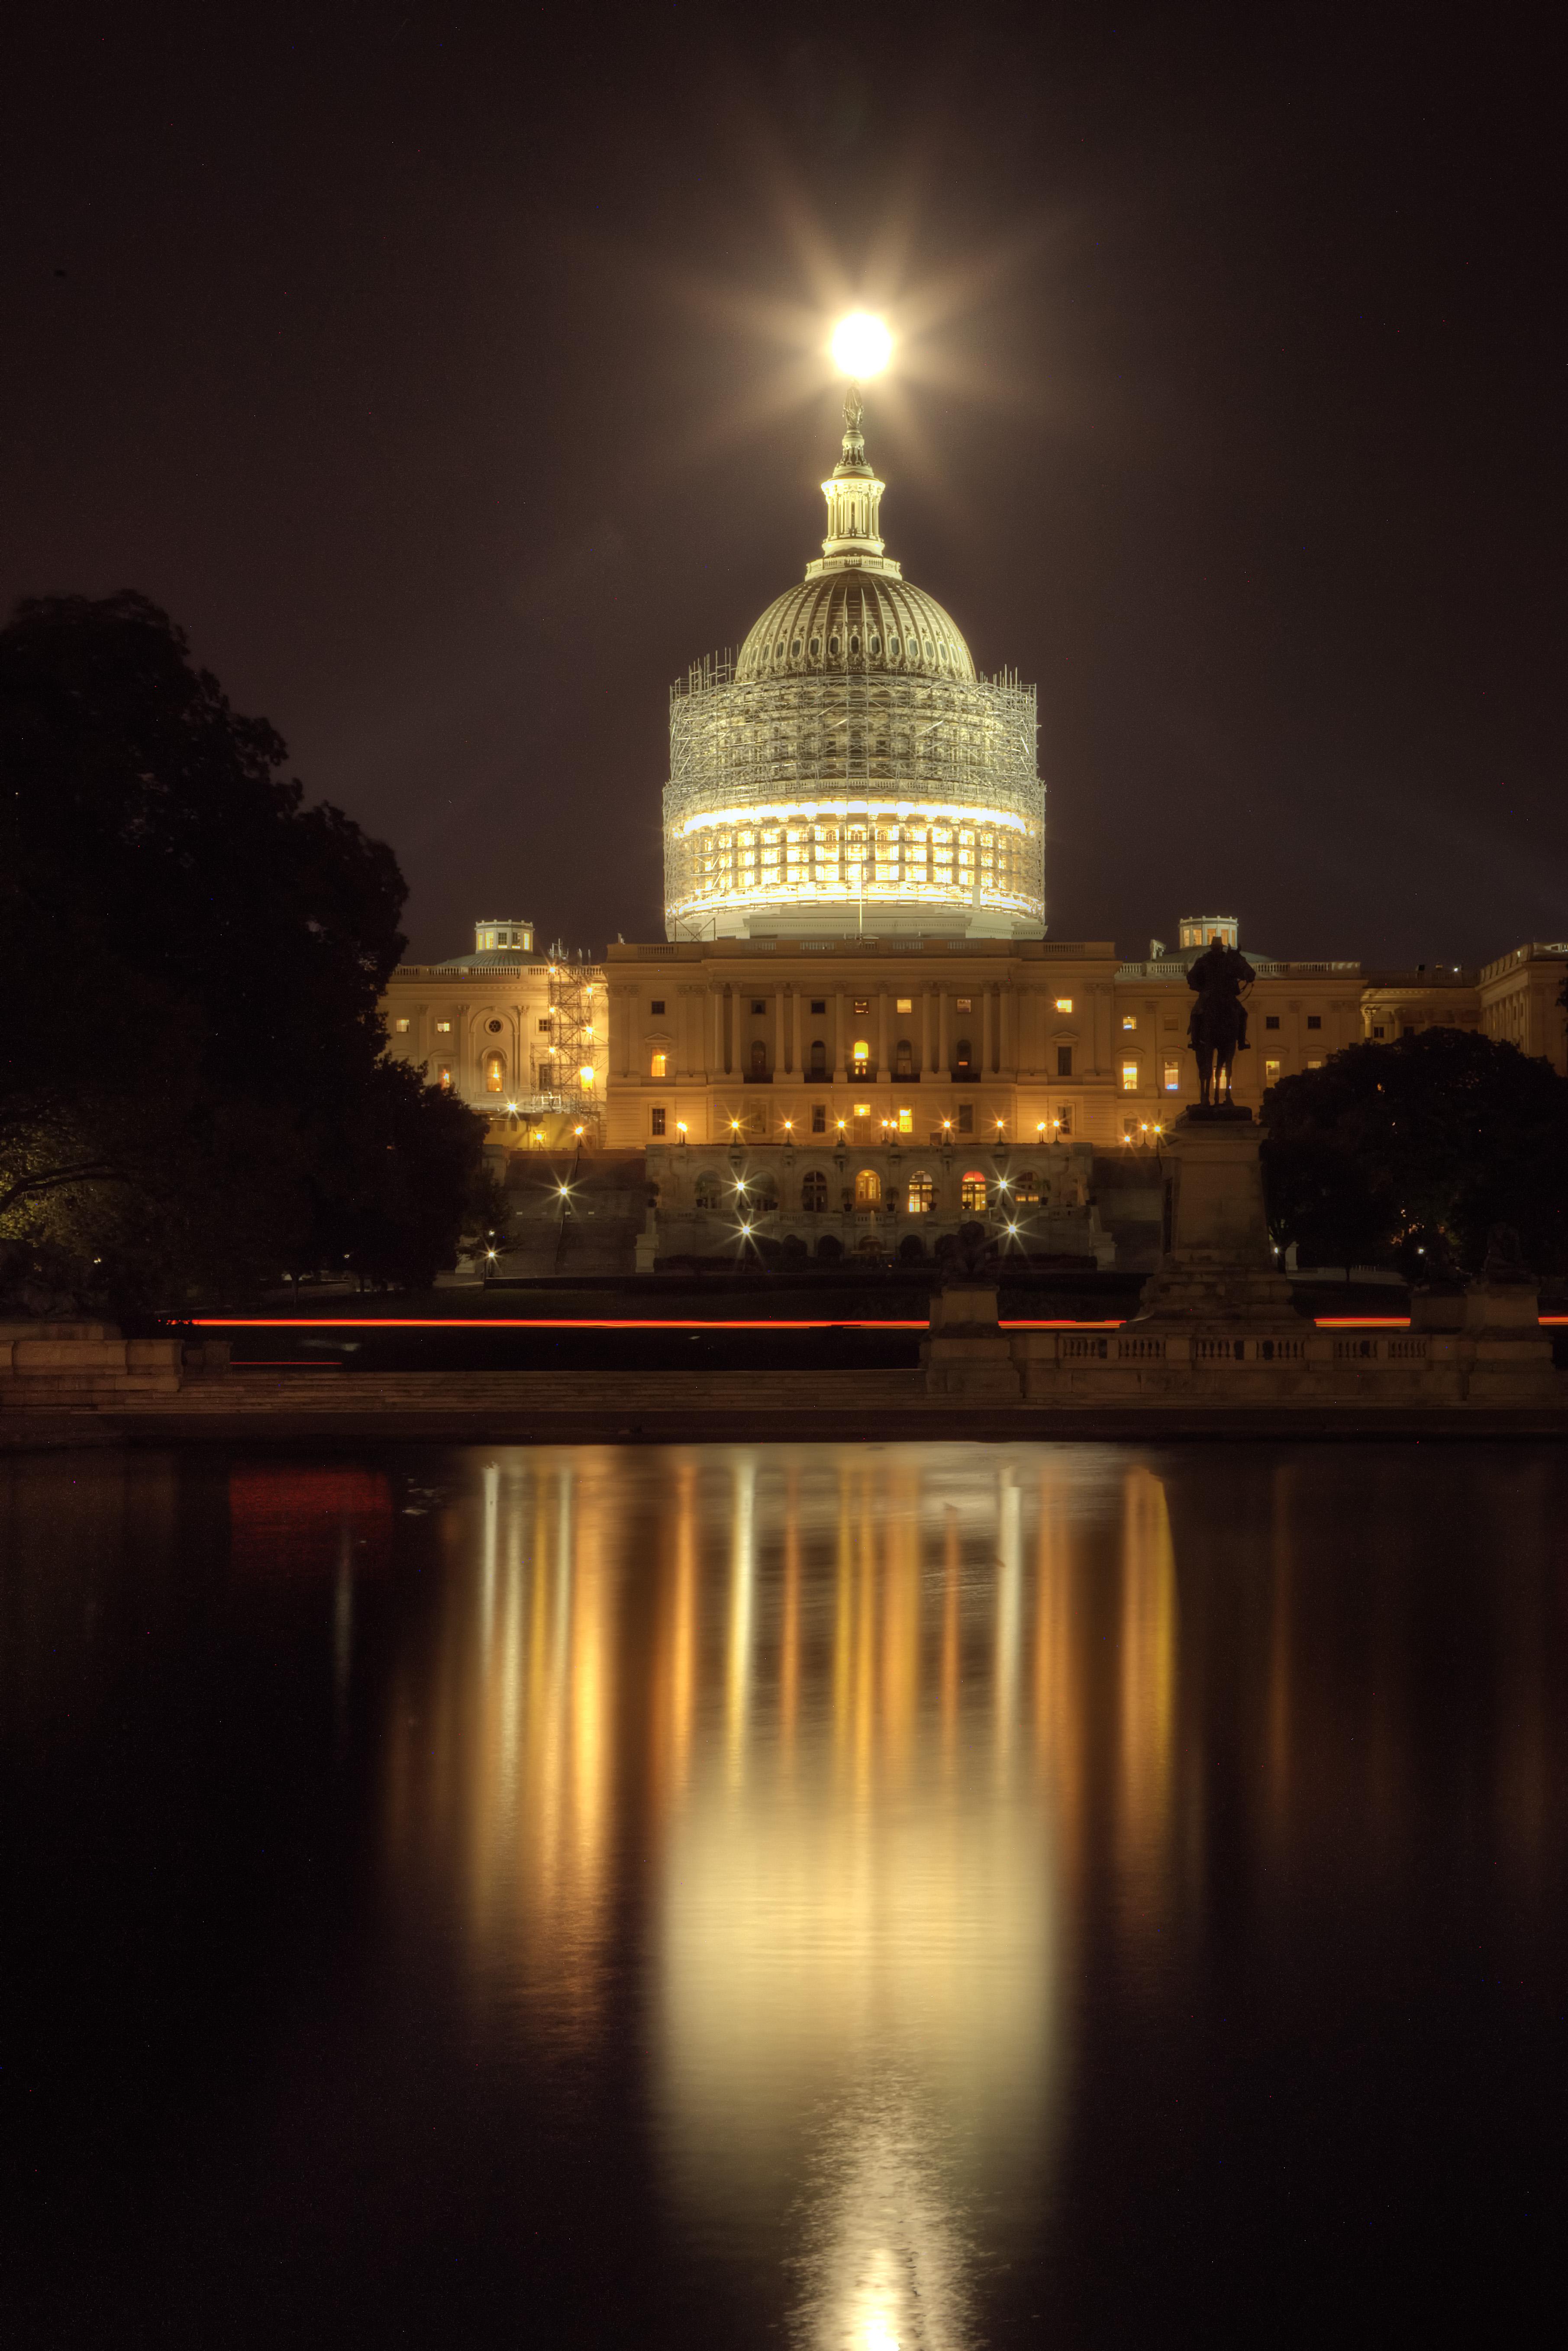 Capitol Building Scaffolding : Scaffolding